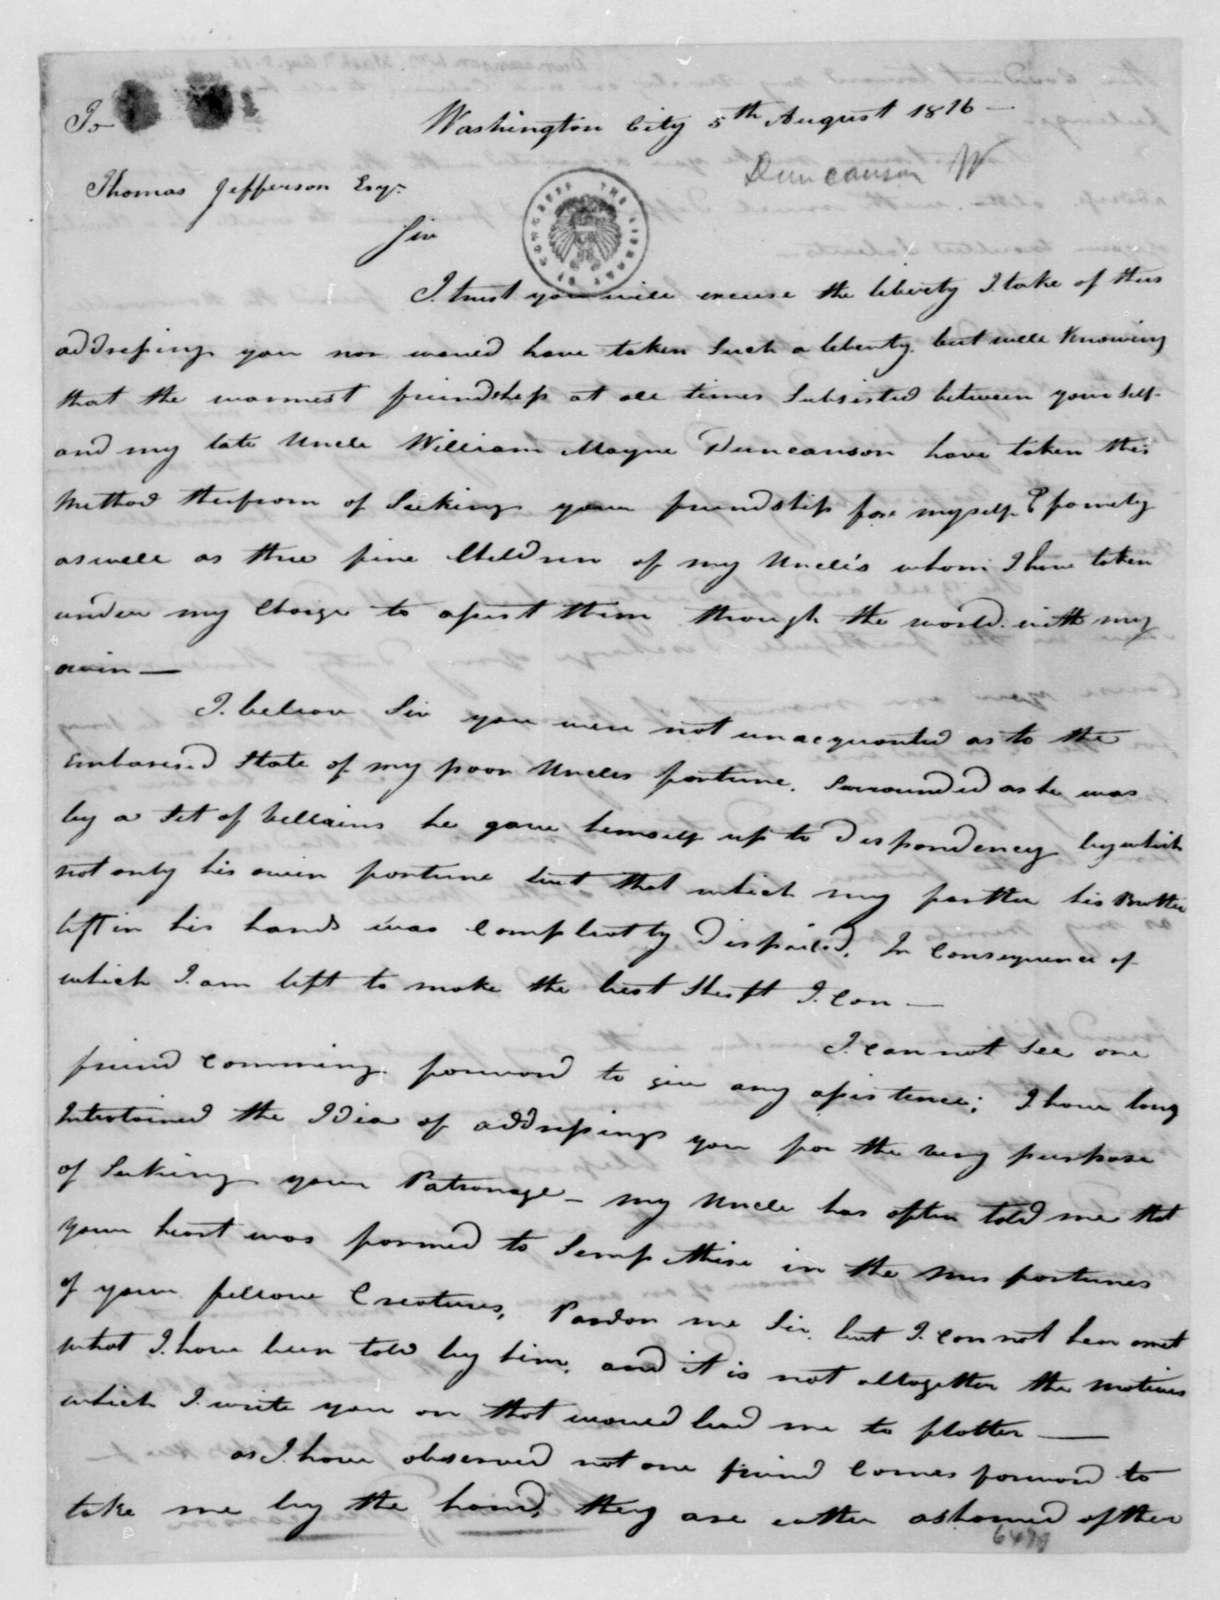 William Duncanson to Thomas Jefferson, August 5, 1816.